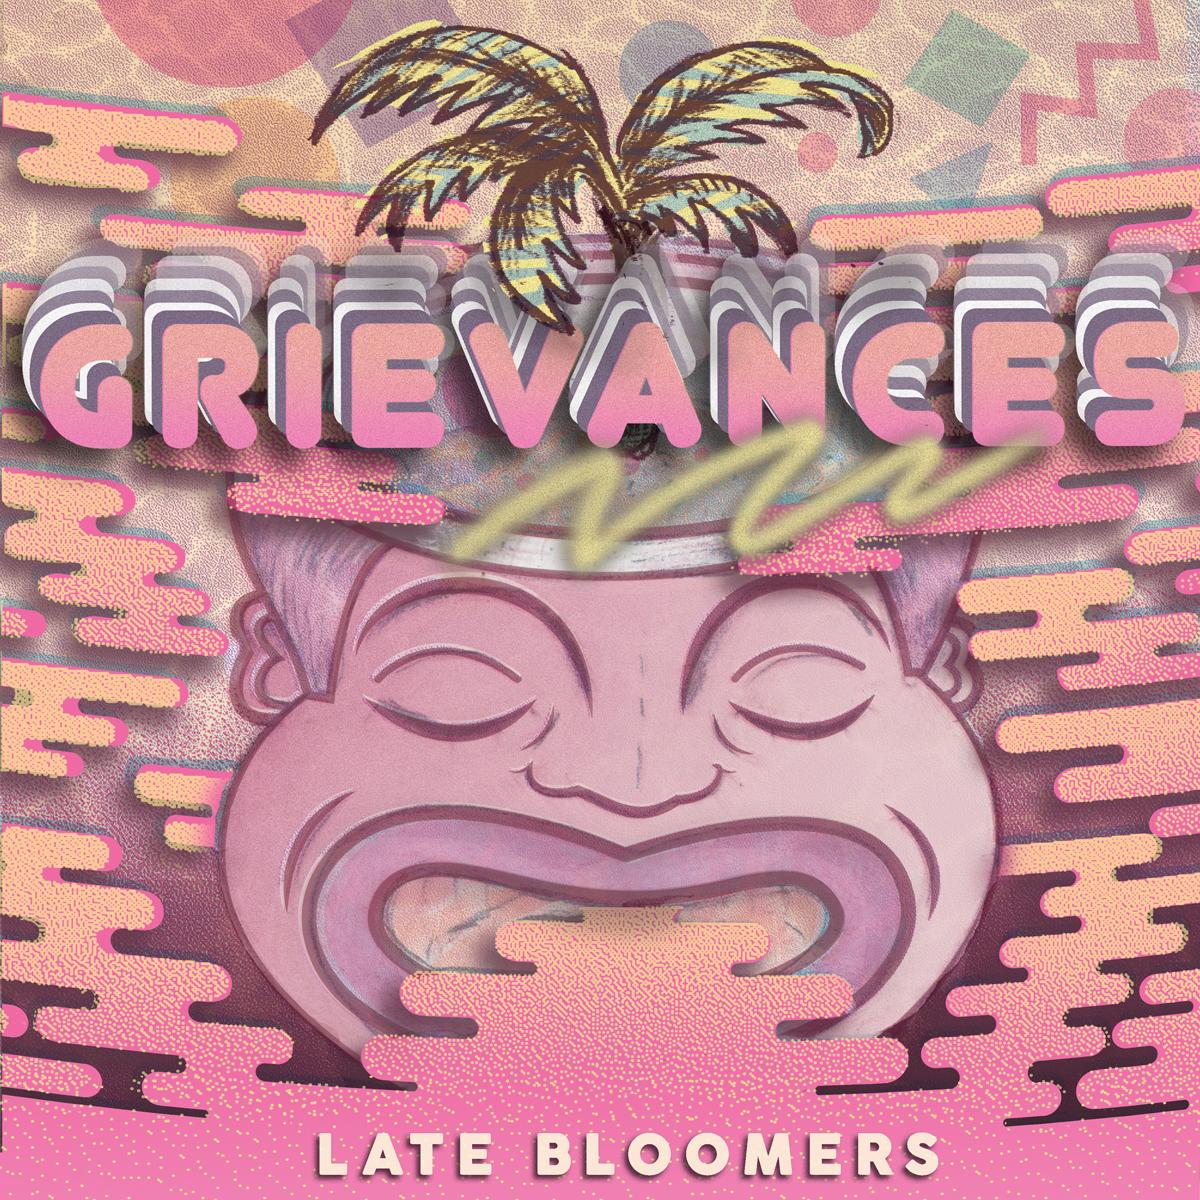 GRIEVANCES - LATE BLOOMERS (album)